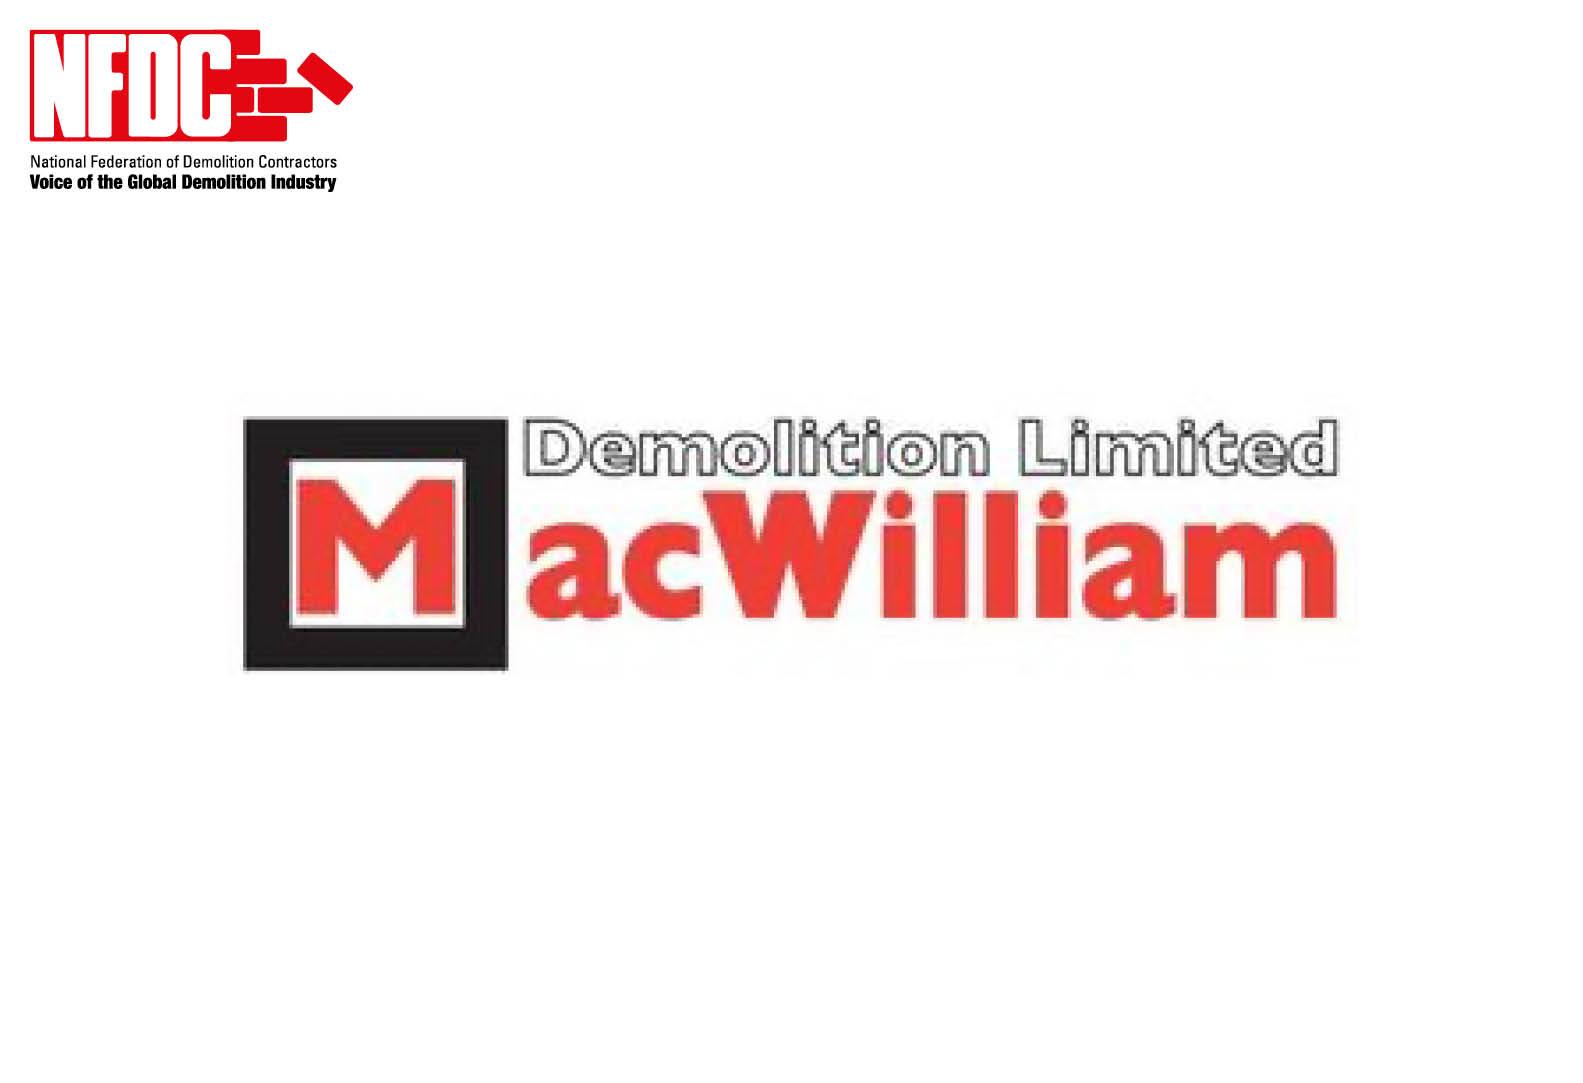 MacWilliam Demolition